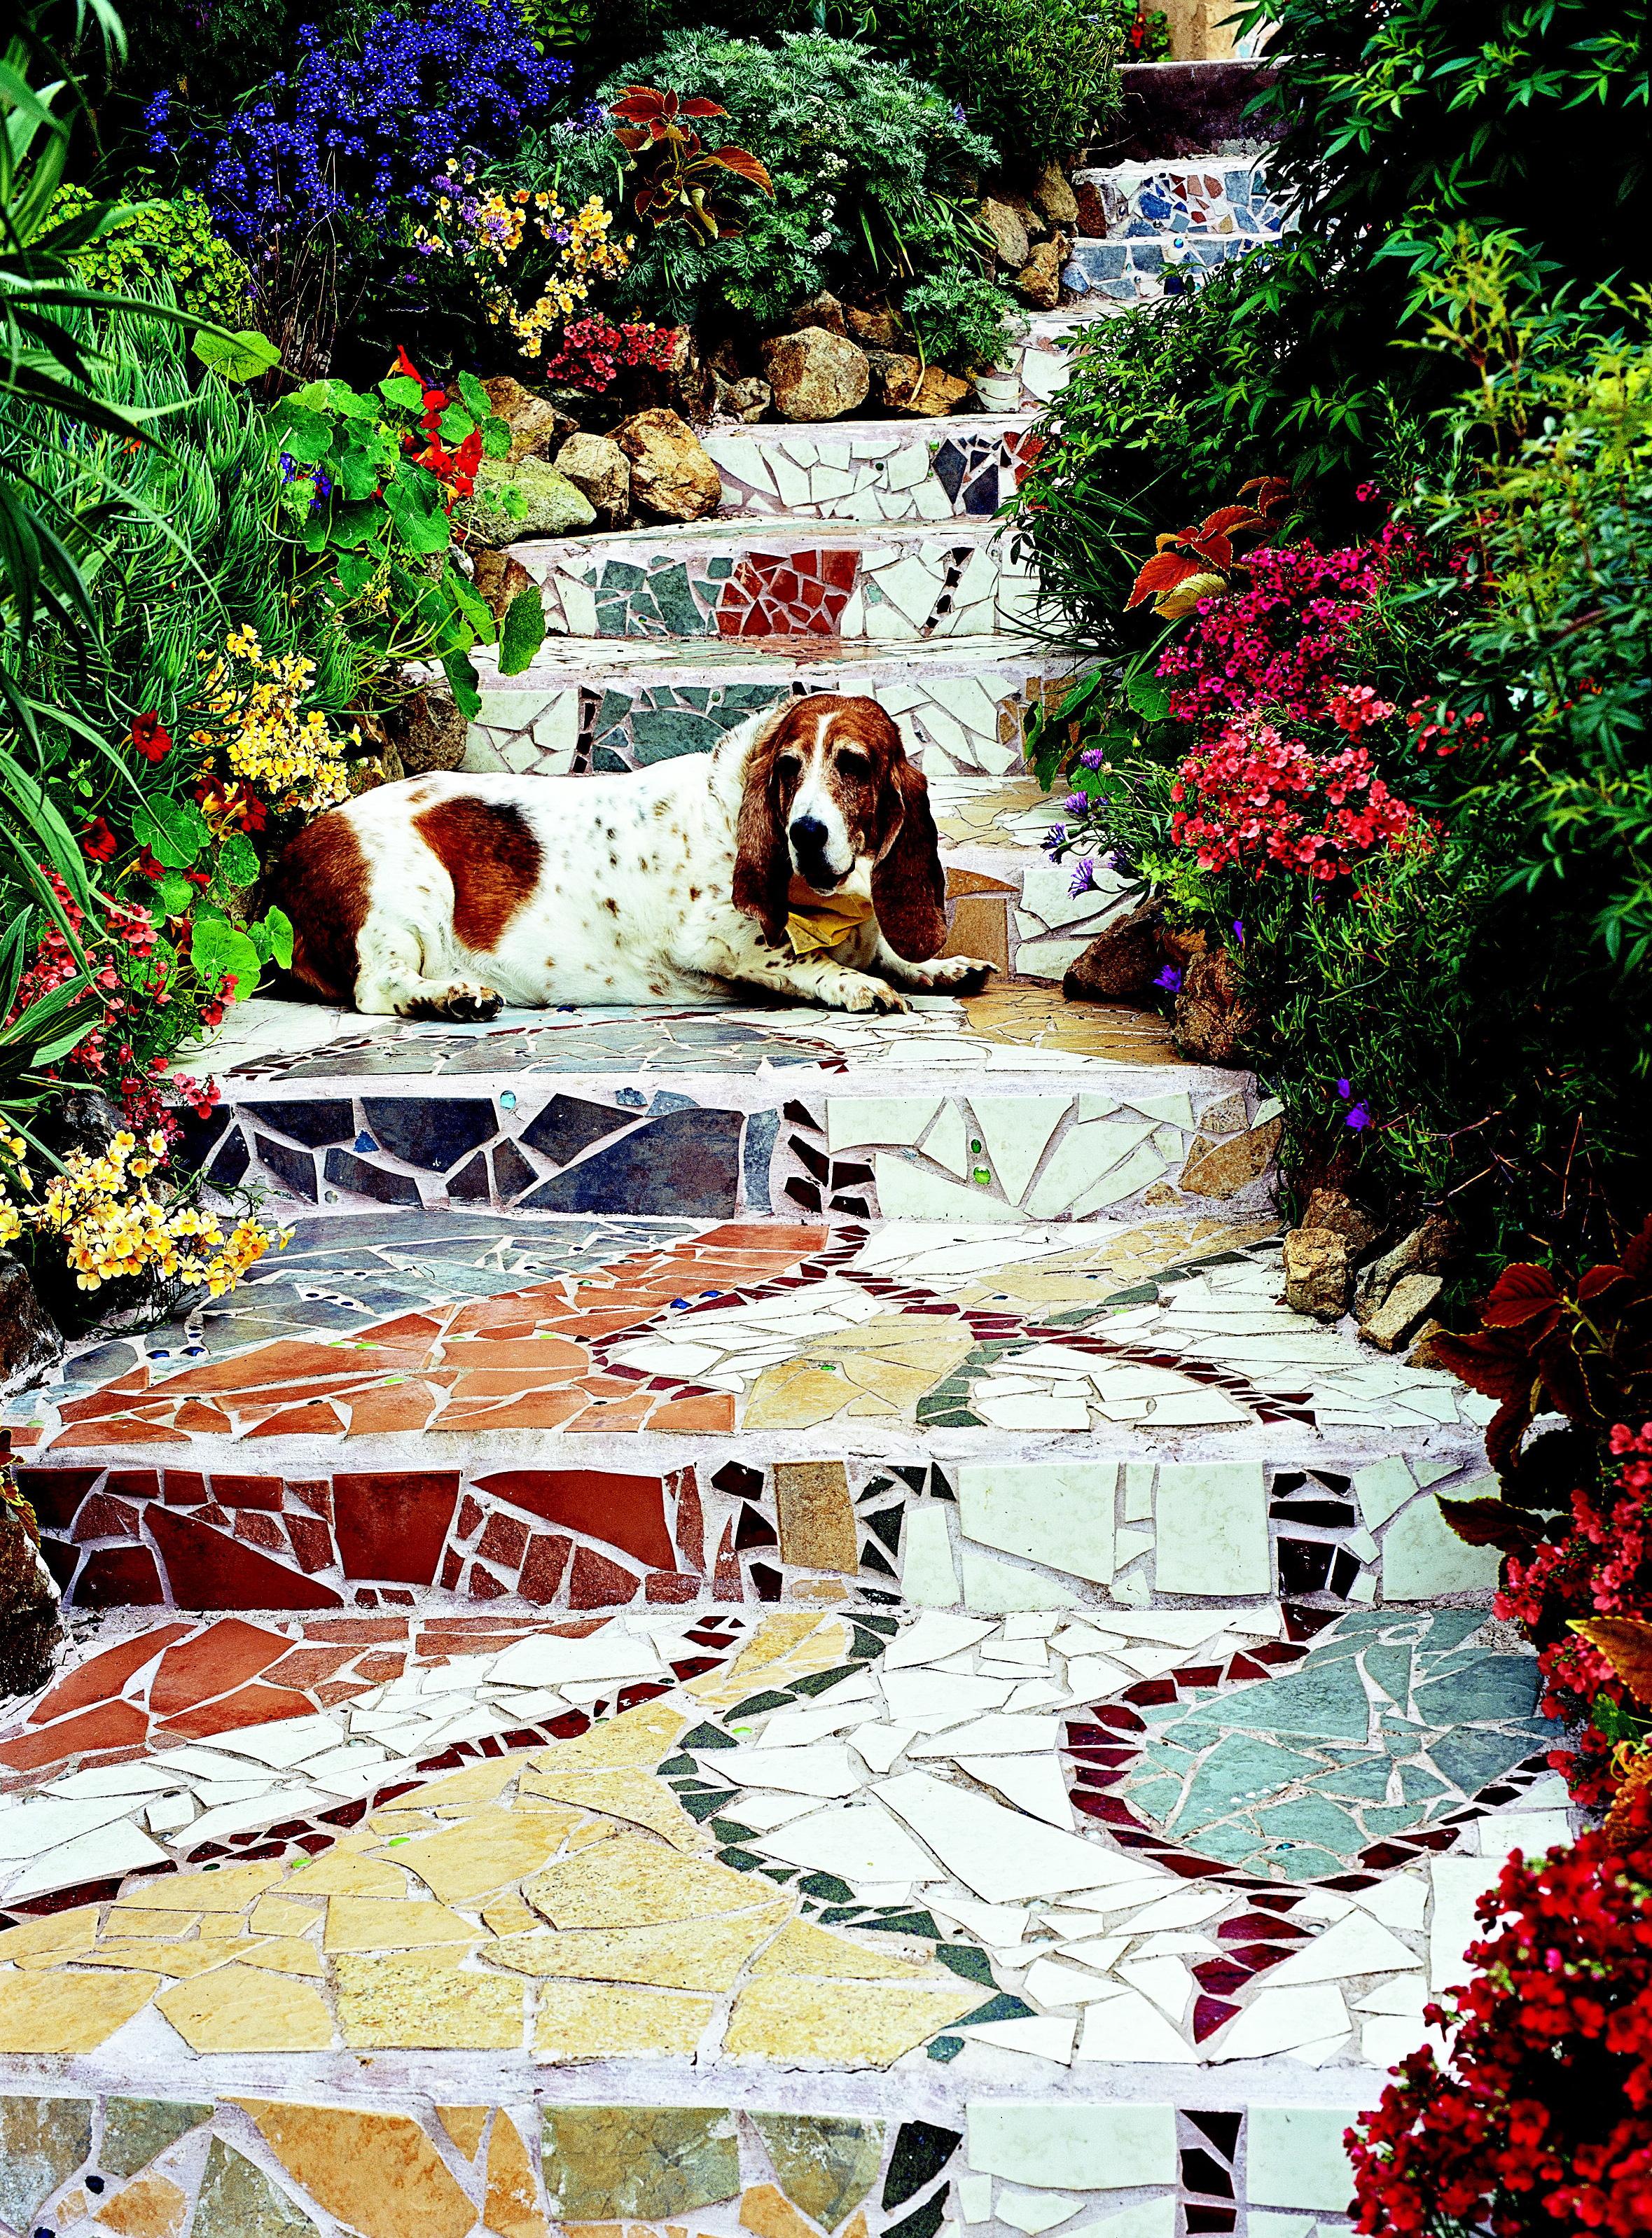 Swirling steps